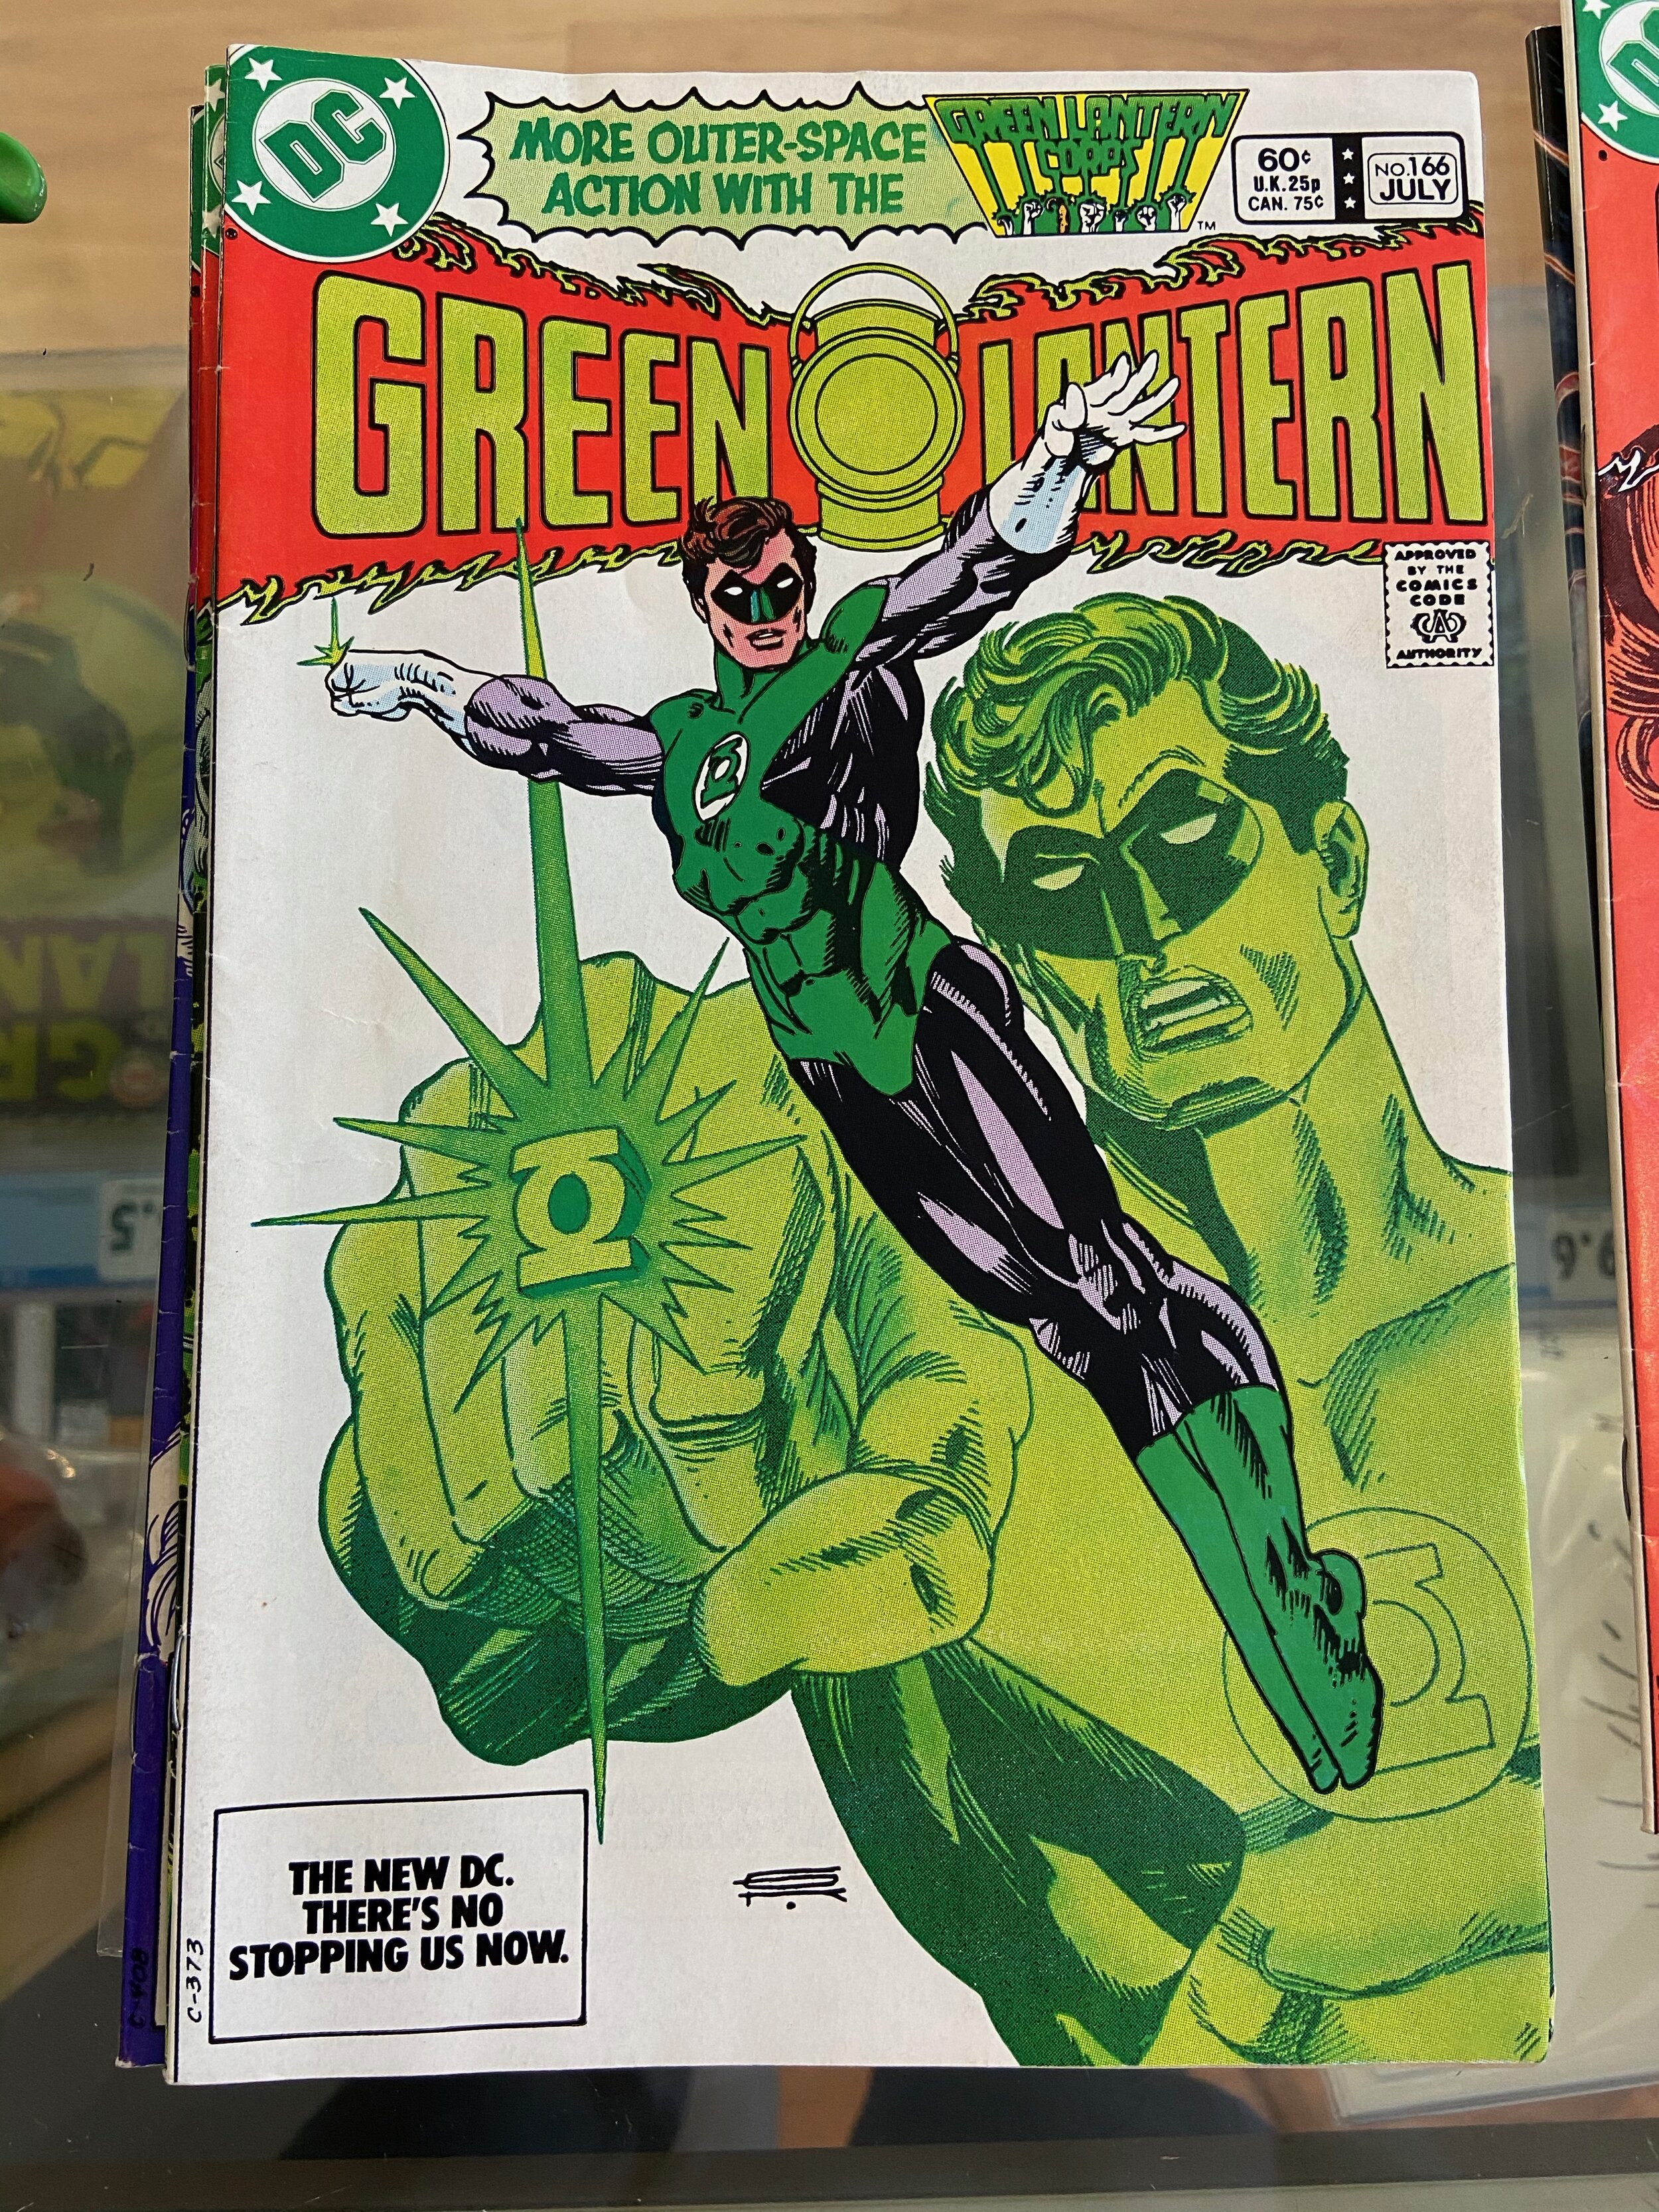 DC WRATH 2012 1st Print GREEN LANTERN NEW GUARDIANS #17 1:25 VARIANT COVER